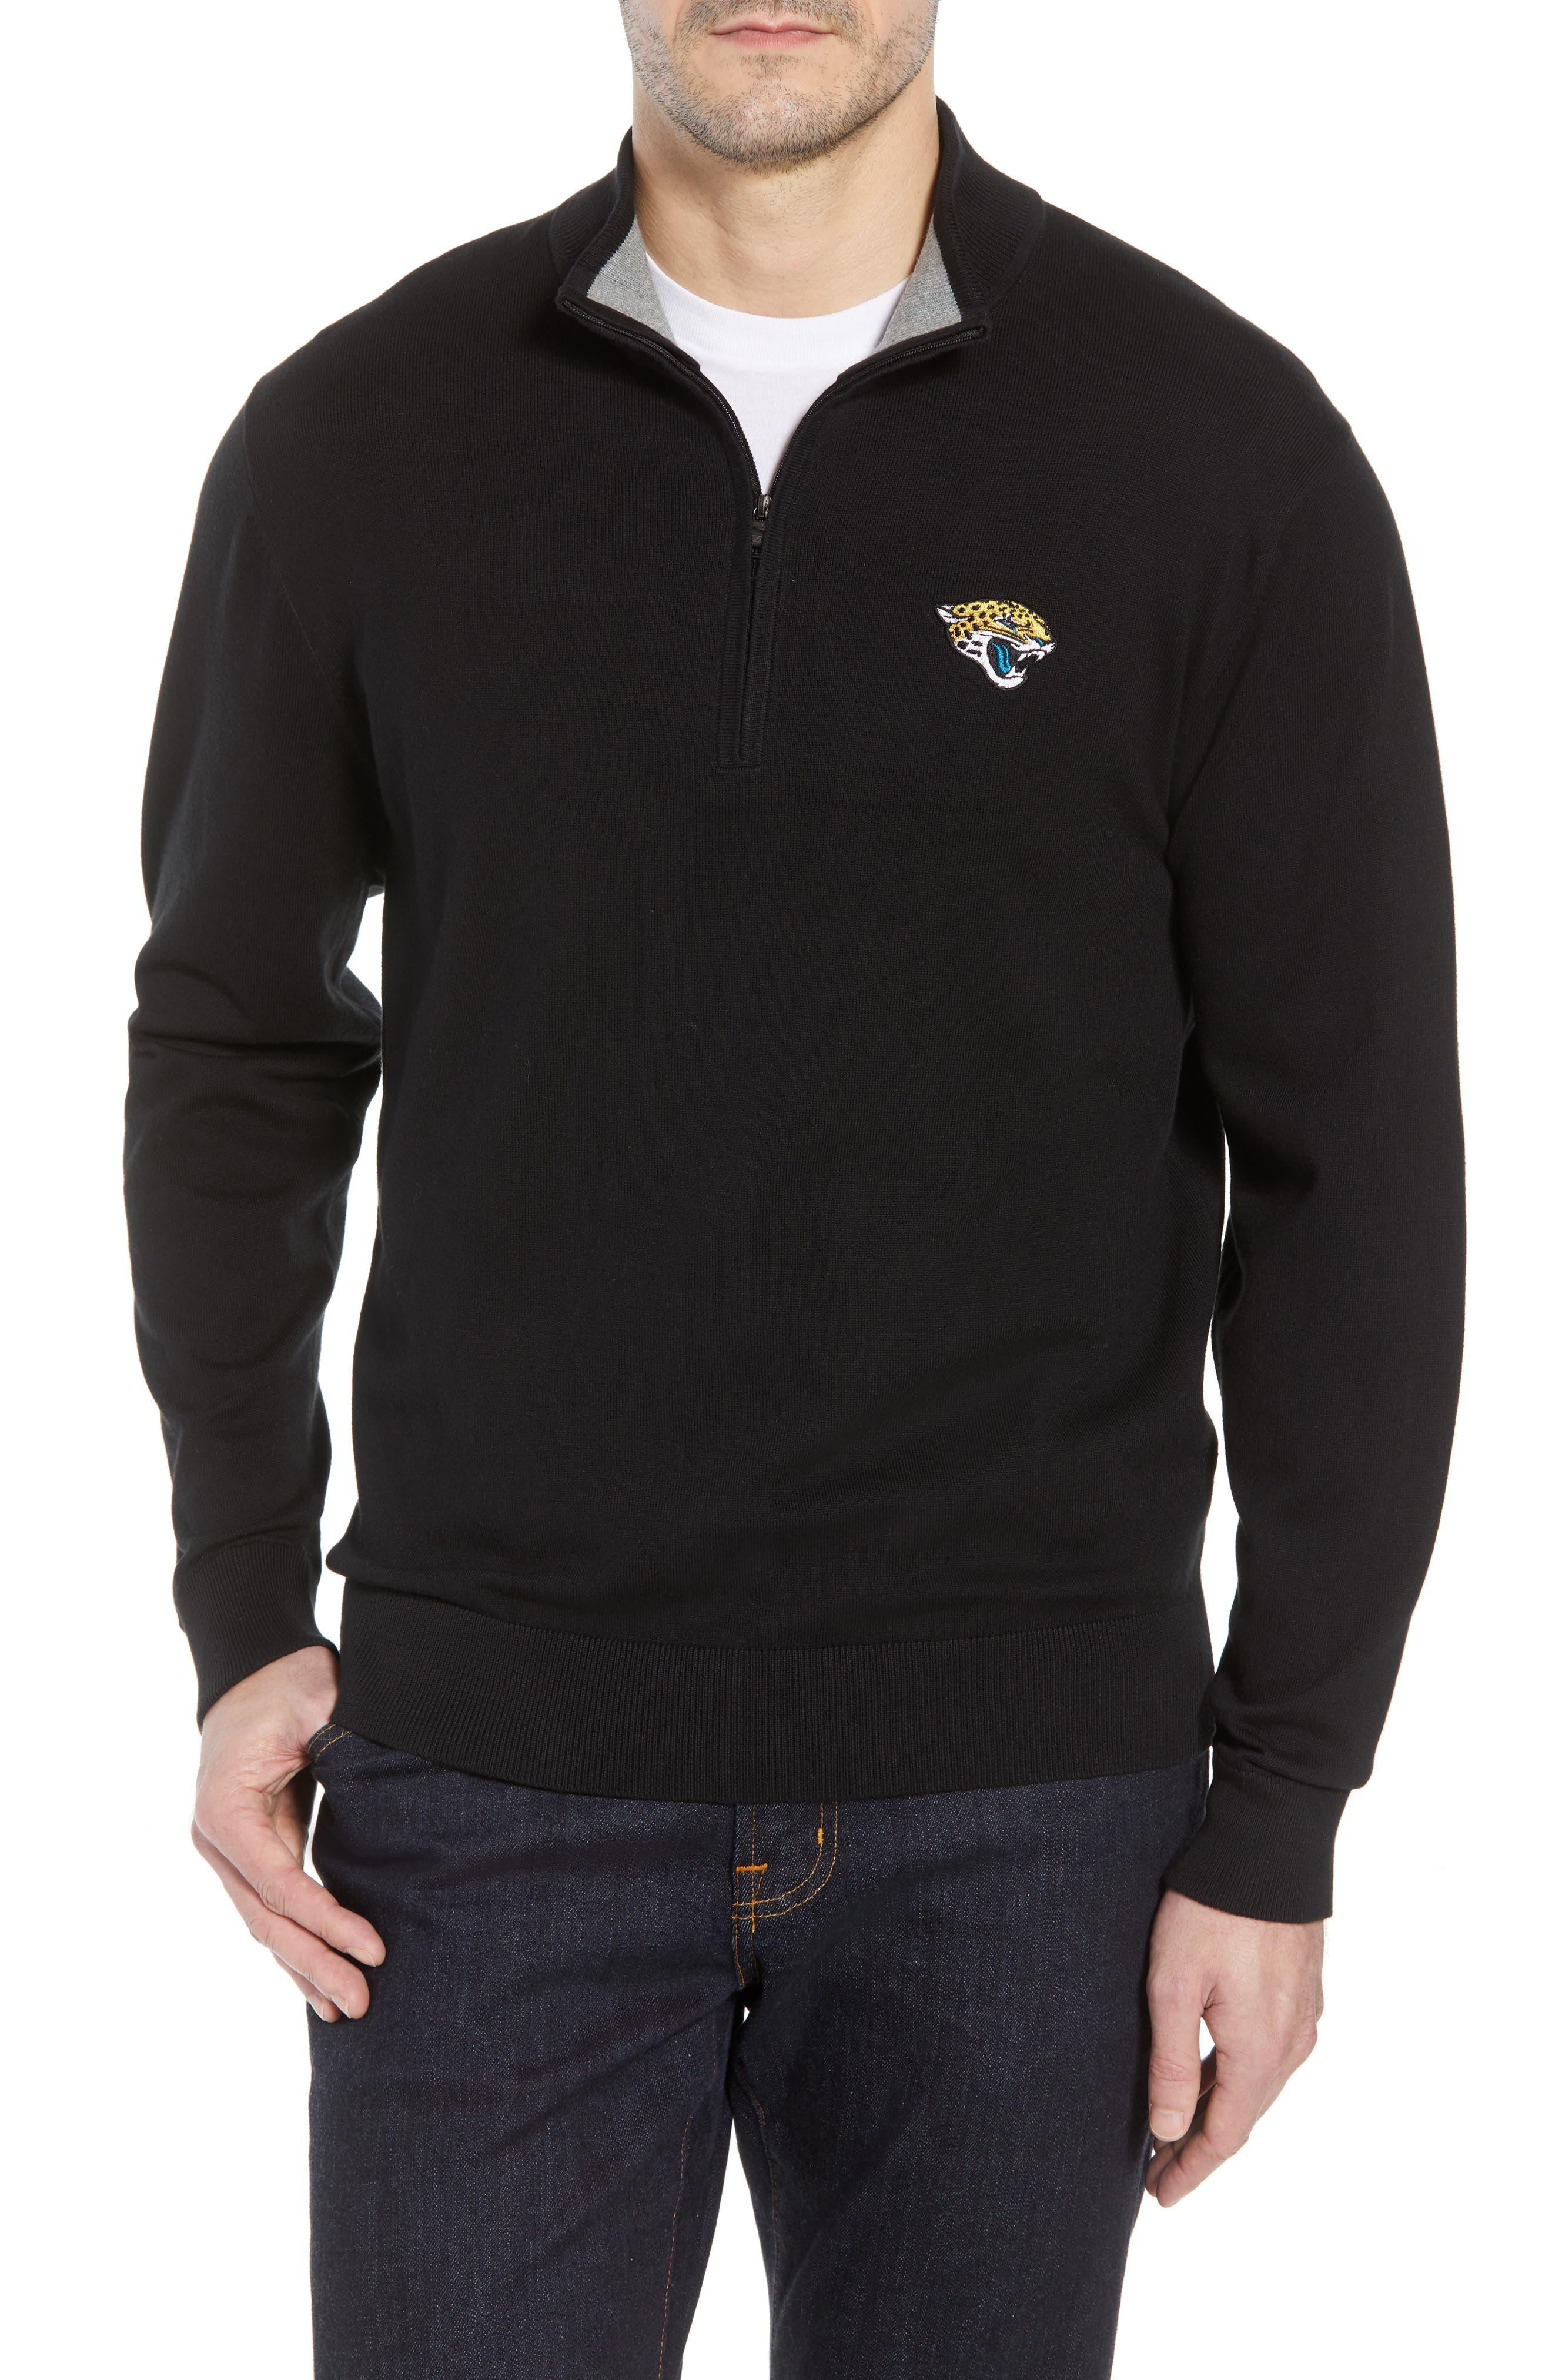 Jacksonville Jaguars - Lakemont Regular Fit Quarter Zip Sweater,                             Main thumbnail 1, color,                             BLACK